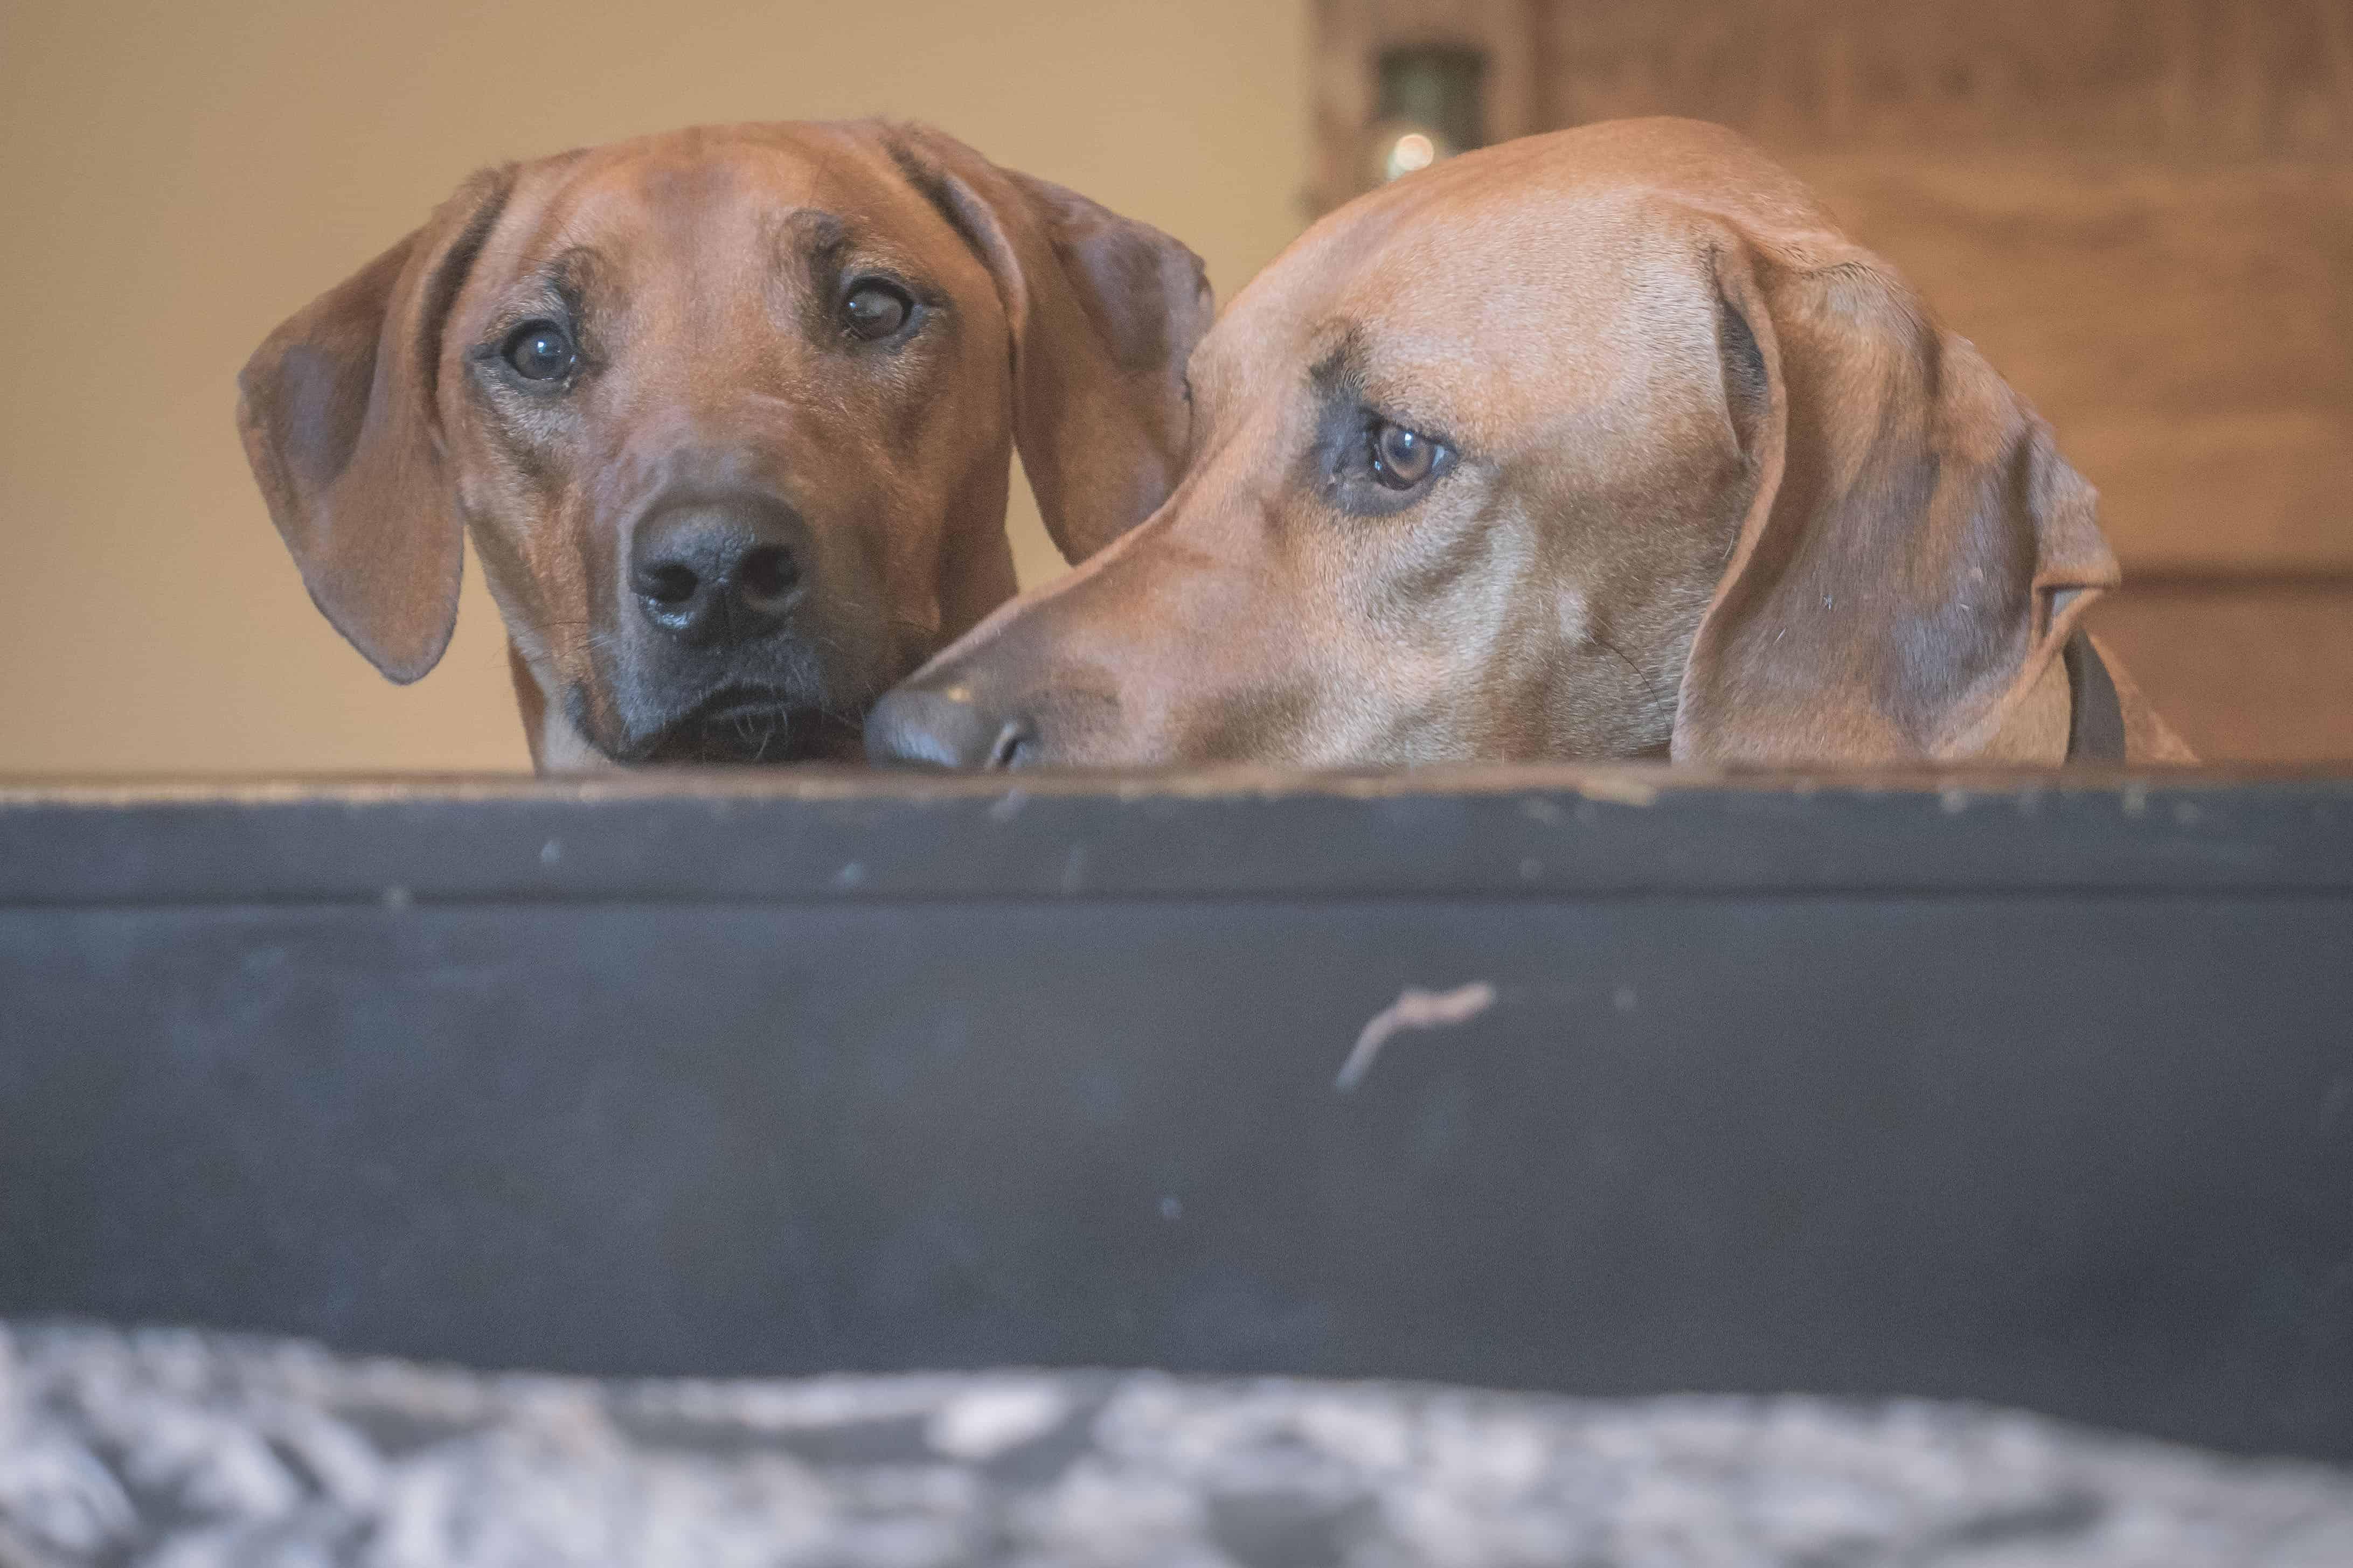 Rhodesian Ridgeback, puppy, chicago, cute, dog bed